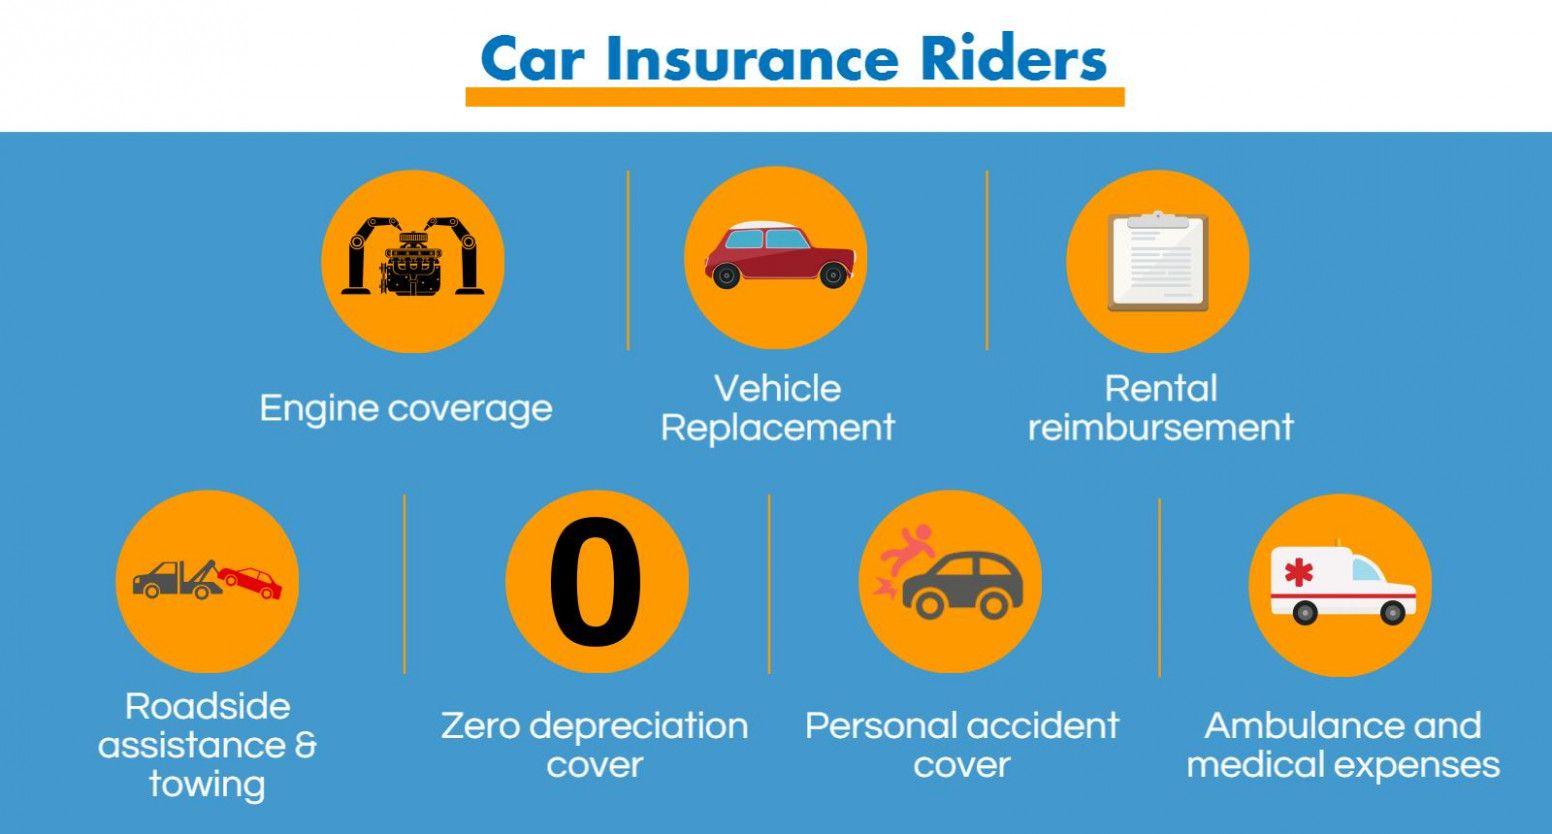 Pin By Yoedee Ali On Soul Insurances Car Insurance Car Rental Car